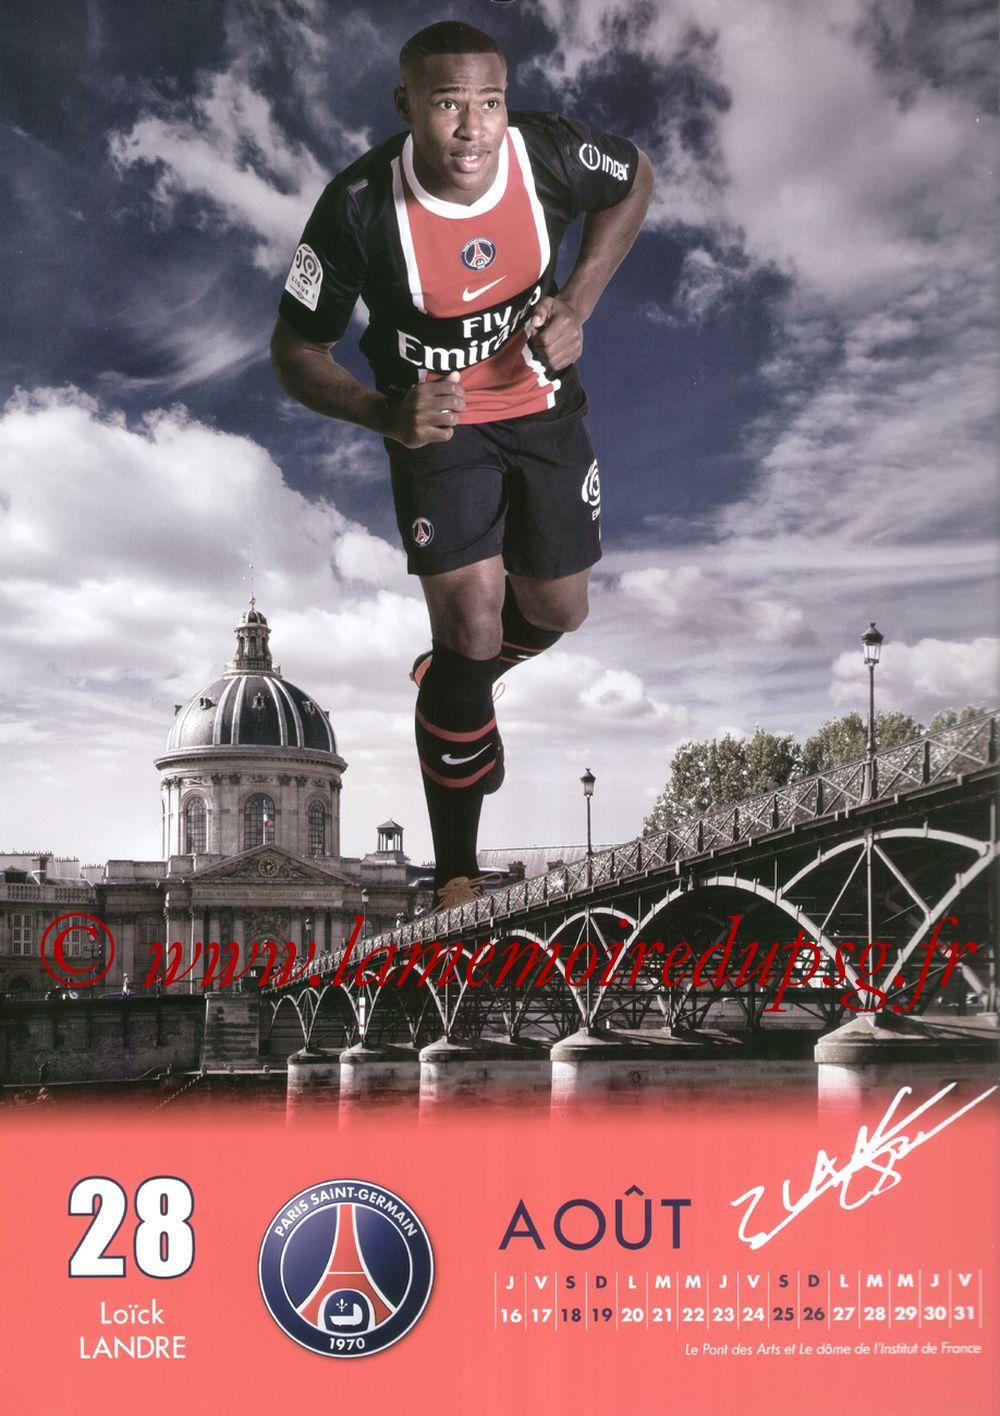 Calendrier PSG 2012 - Page 16 - Loick LANDRE